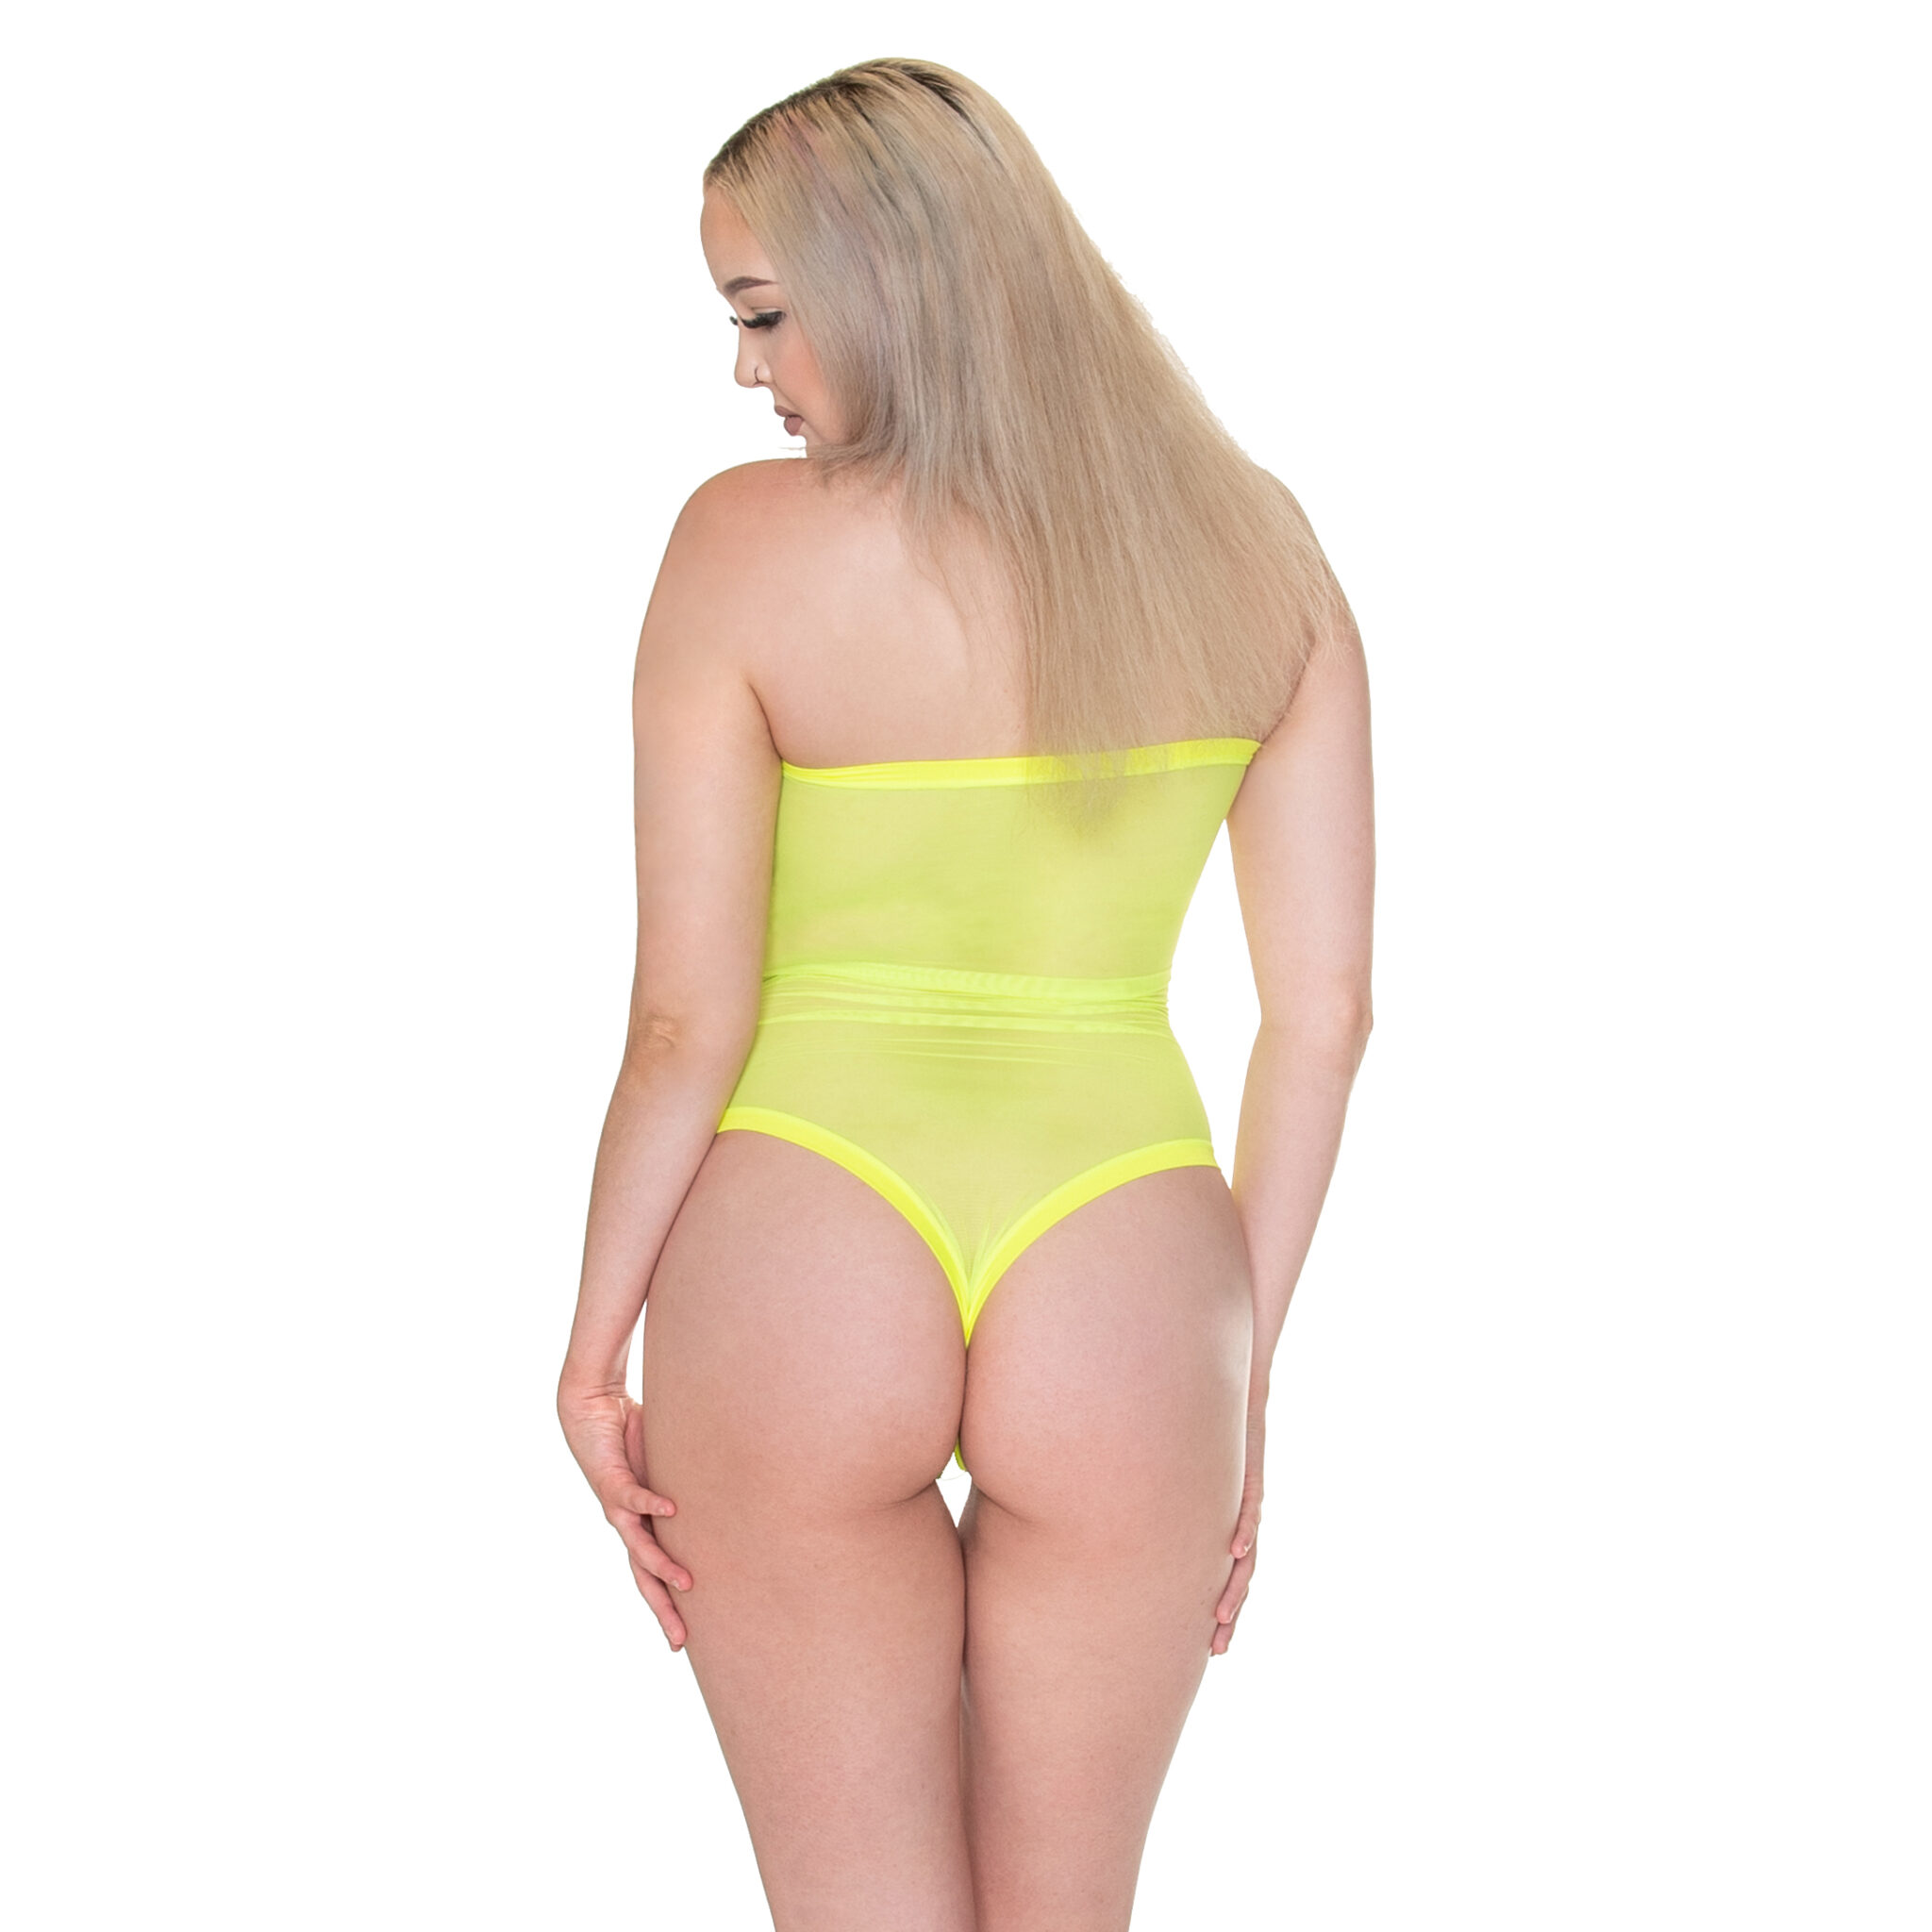 Mesh Bodysuit Sewing Pattern Back View